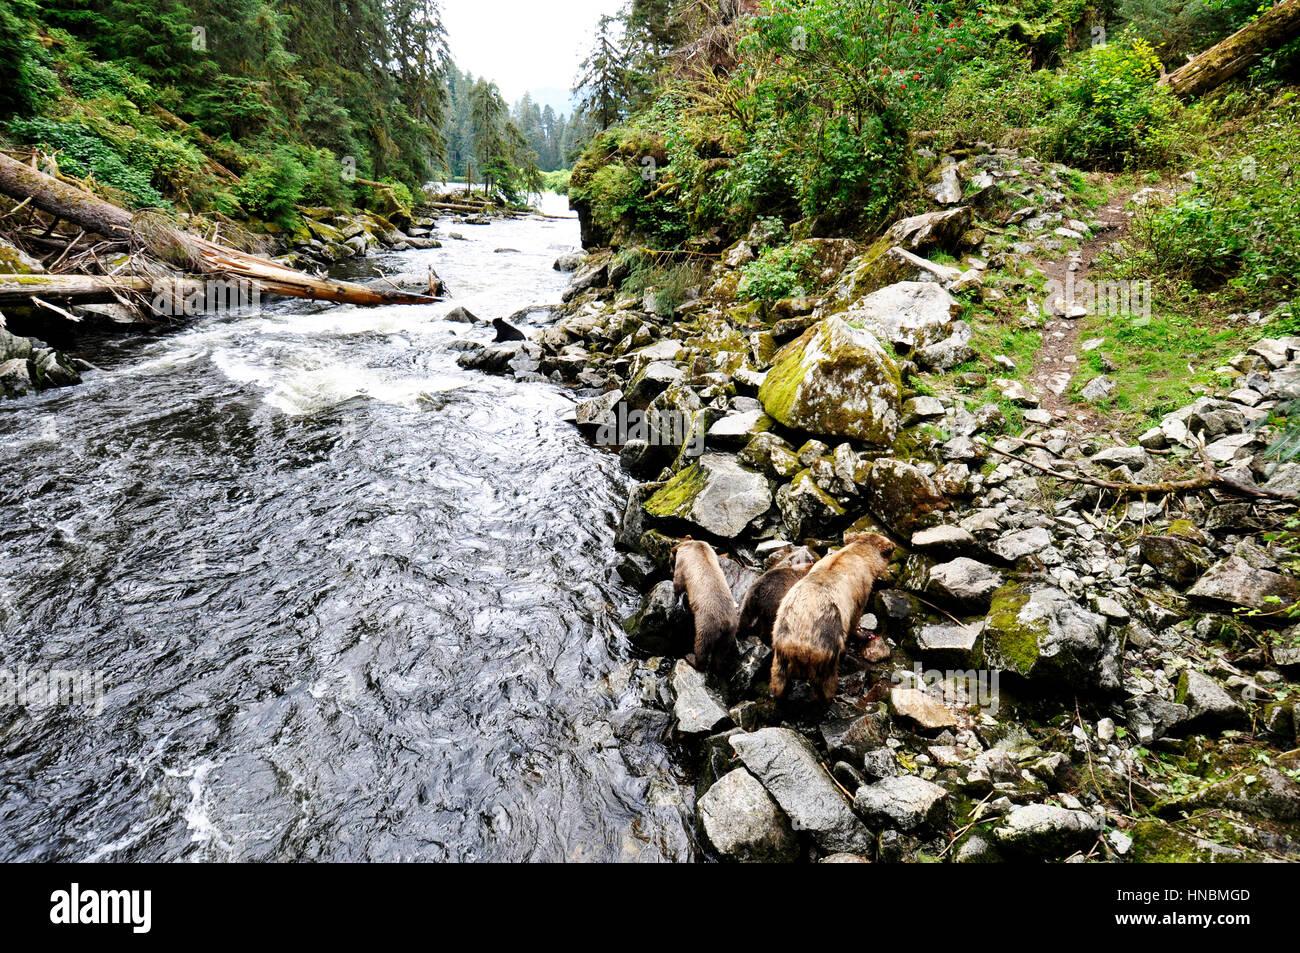 Tongass National Forest, Anan Creek wildlife observatory, Alaska, USA - Stock Image